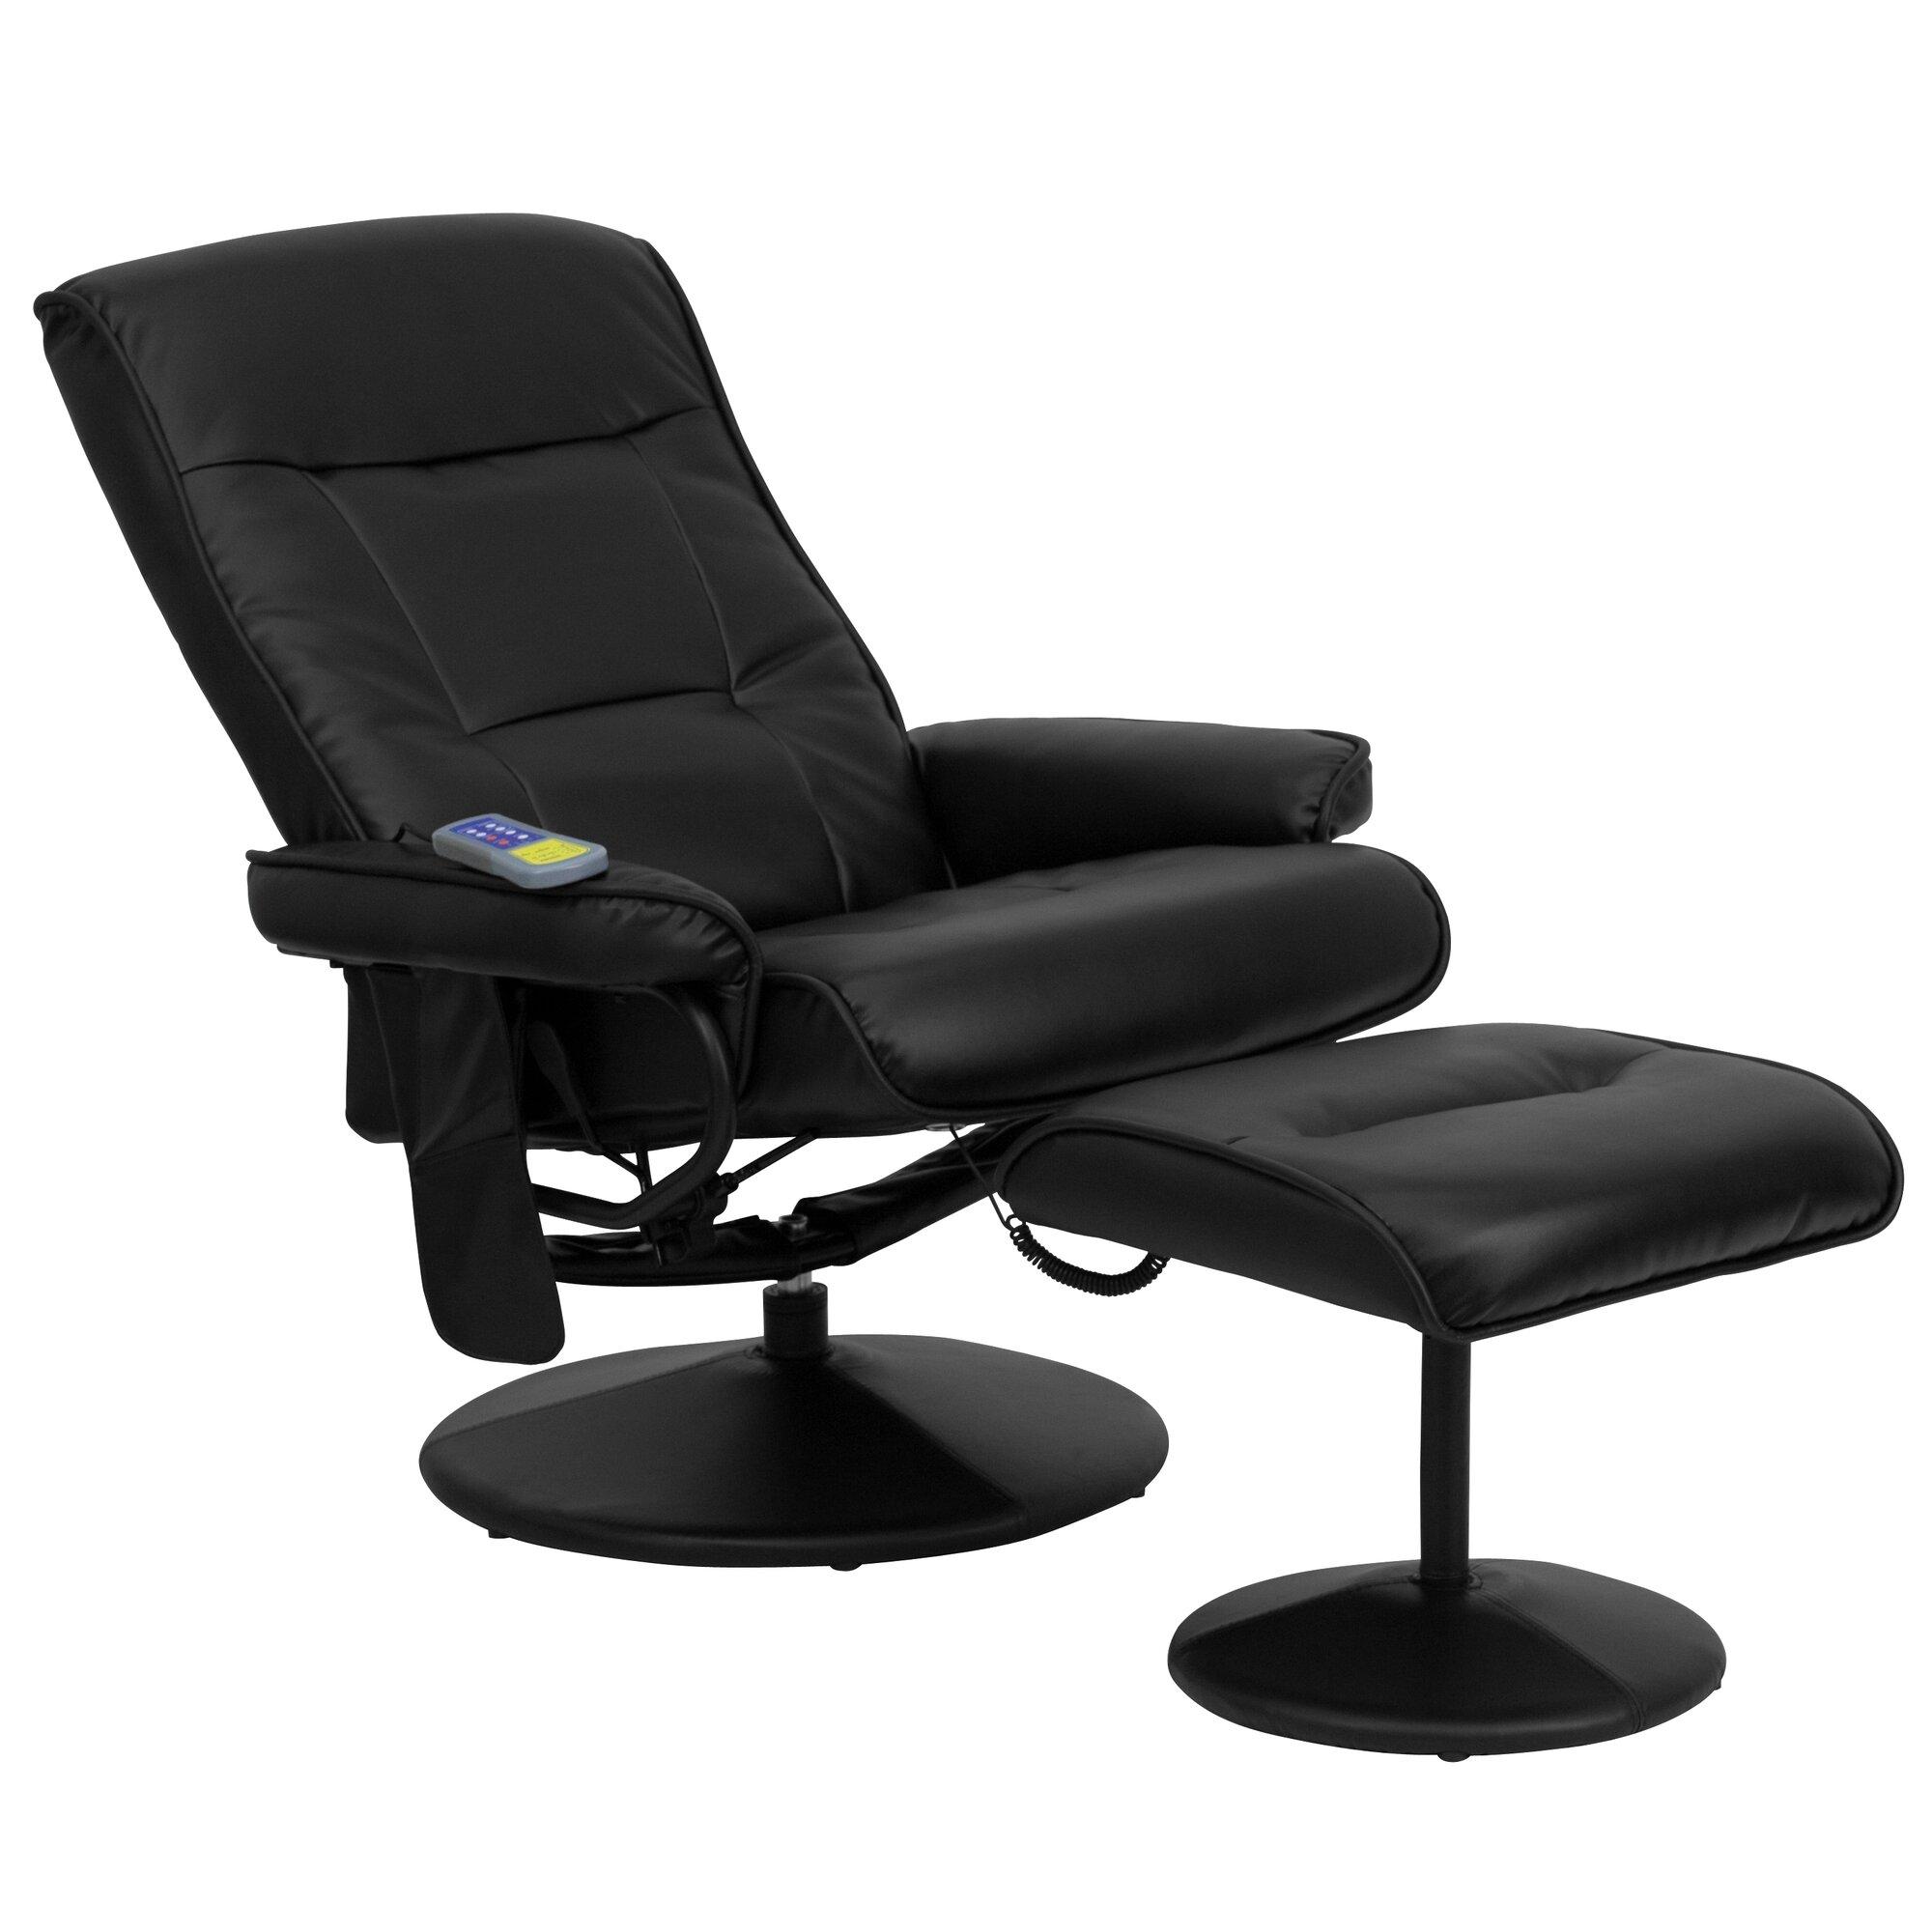 Inspirational Fuji Massage Chair Awesome